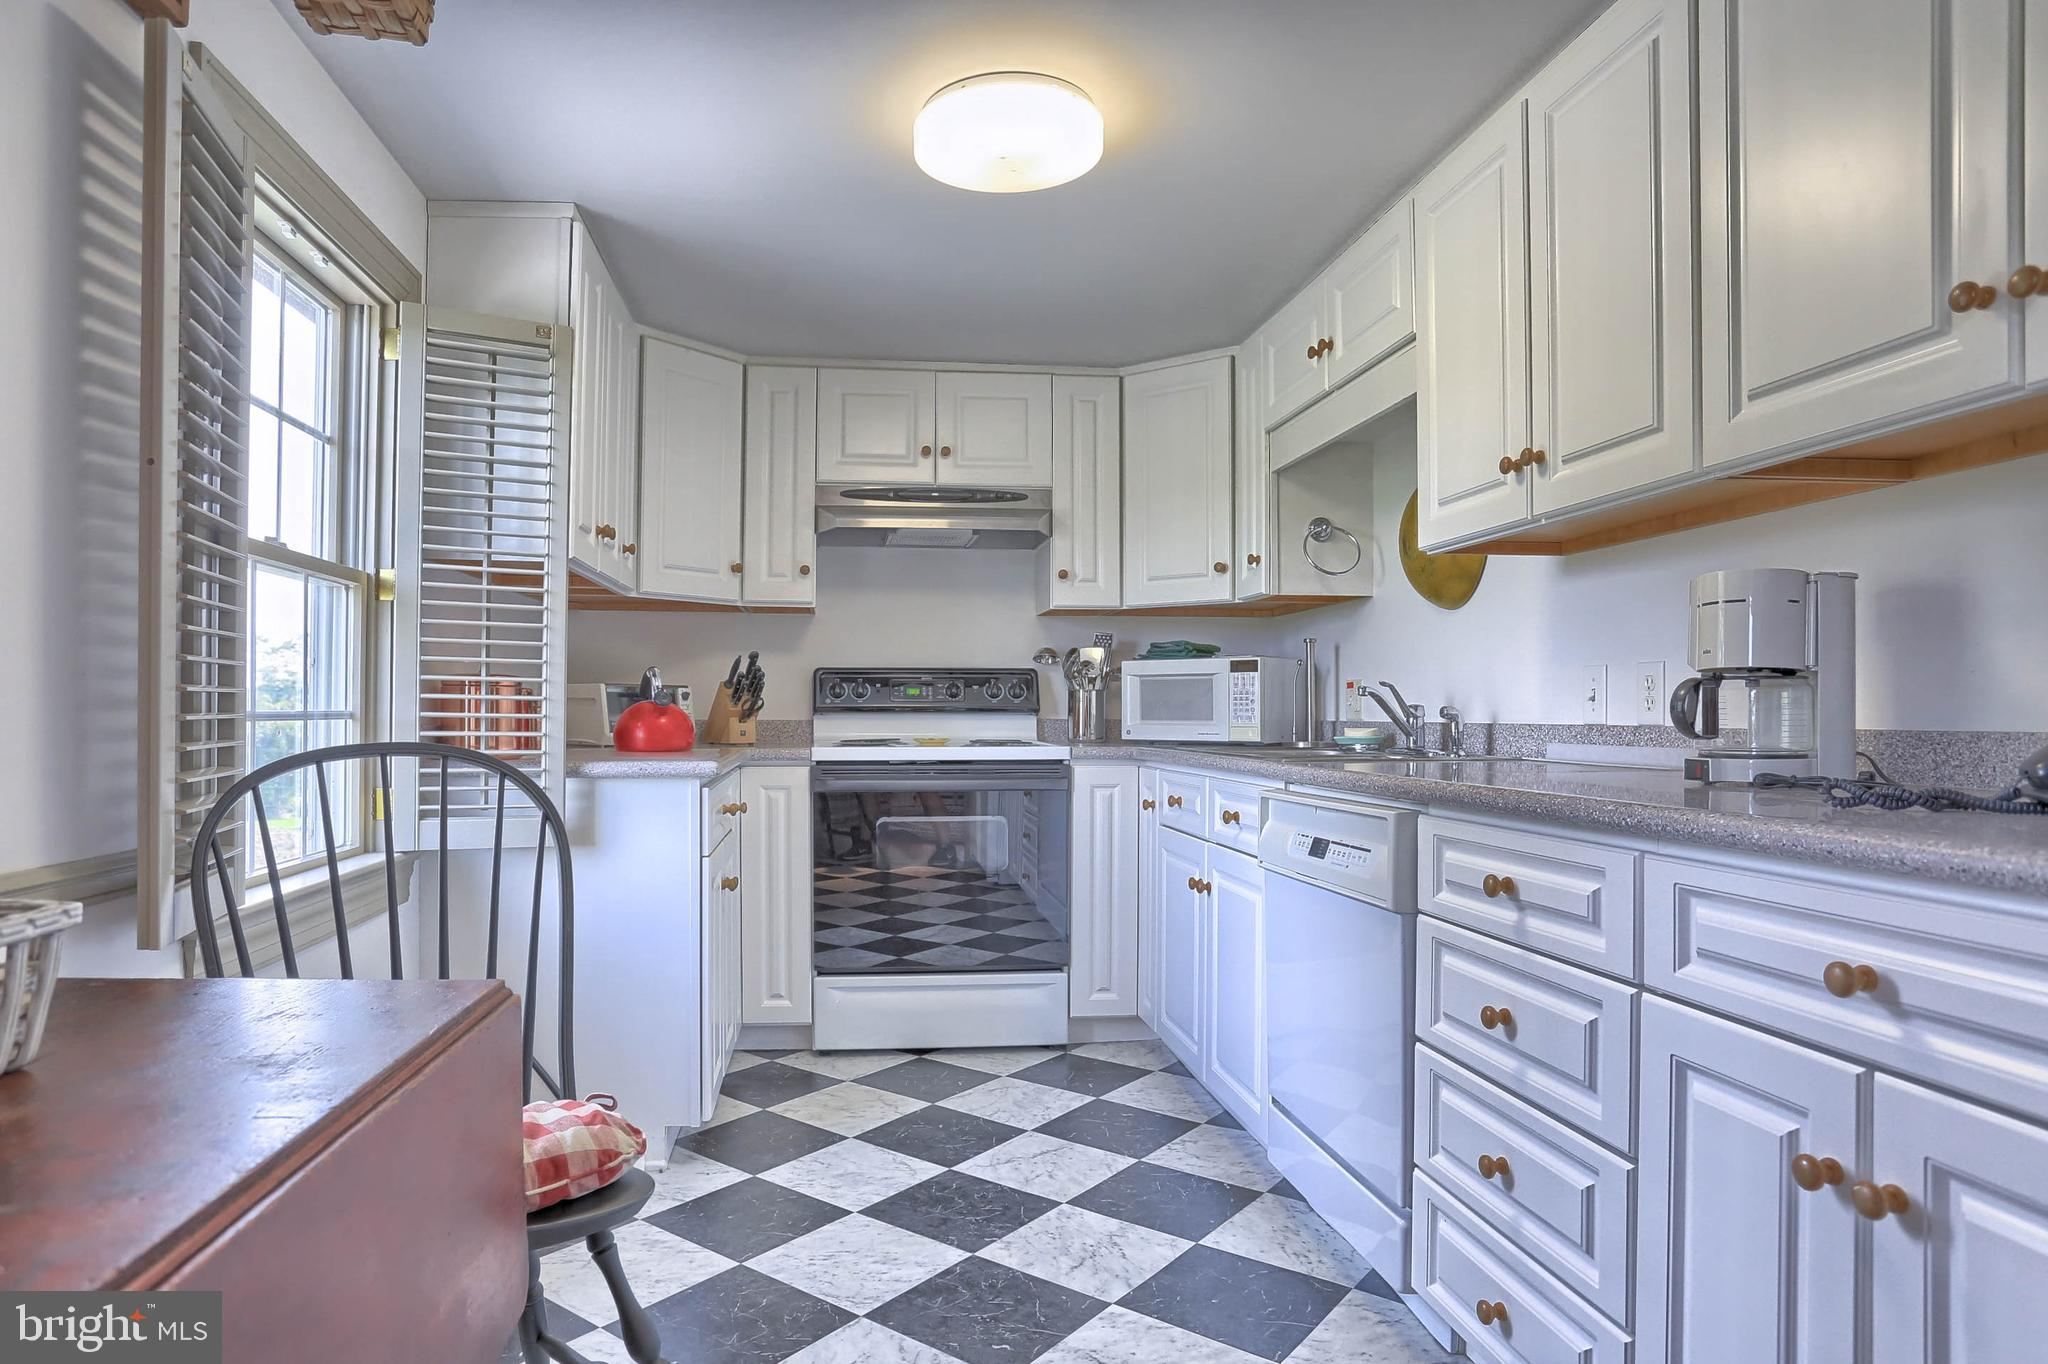 1 Bedroom Guest Apartment